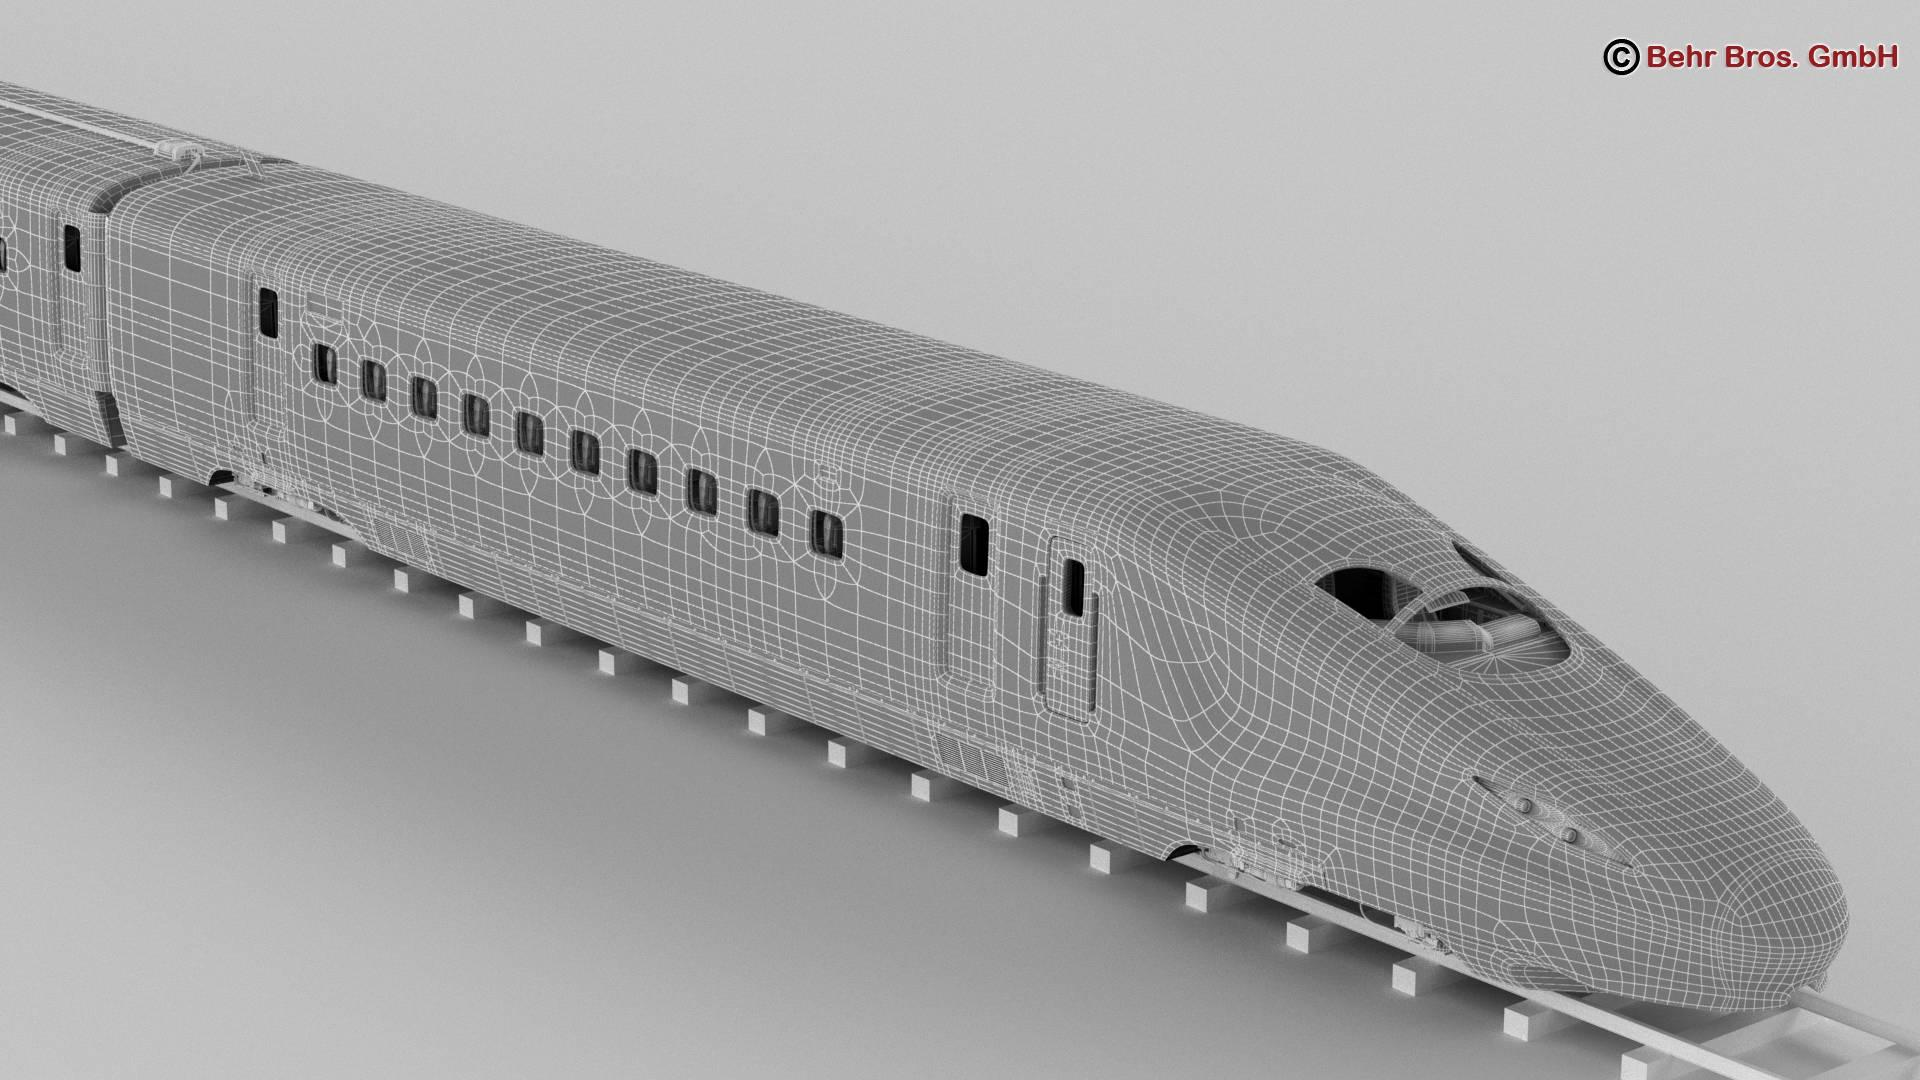 shinkansen e7 3d model 3ds max fbx c4d lwo ma mb obj 265672